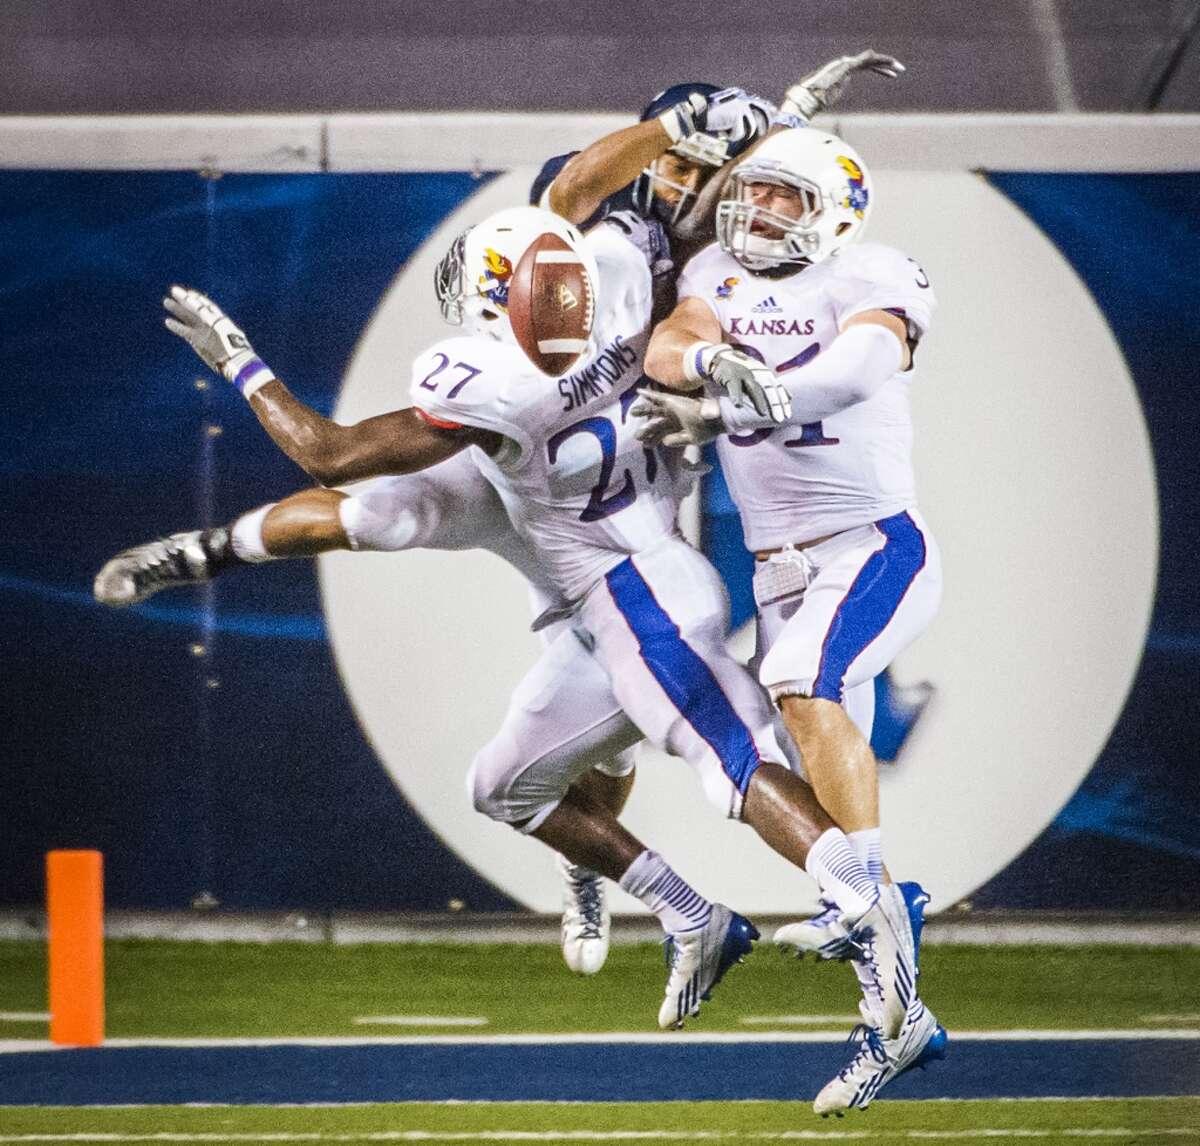 Kansas linebackers Victor Simmons (27) and Ben Heeney (31) break up a pass intended for Rice running back Darik Dillard.